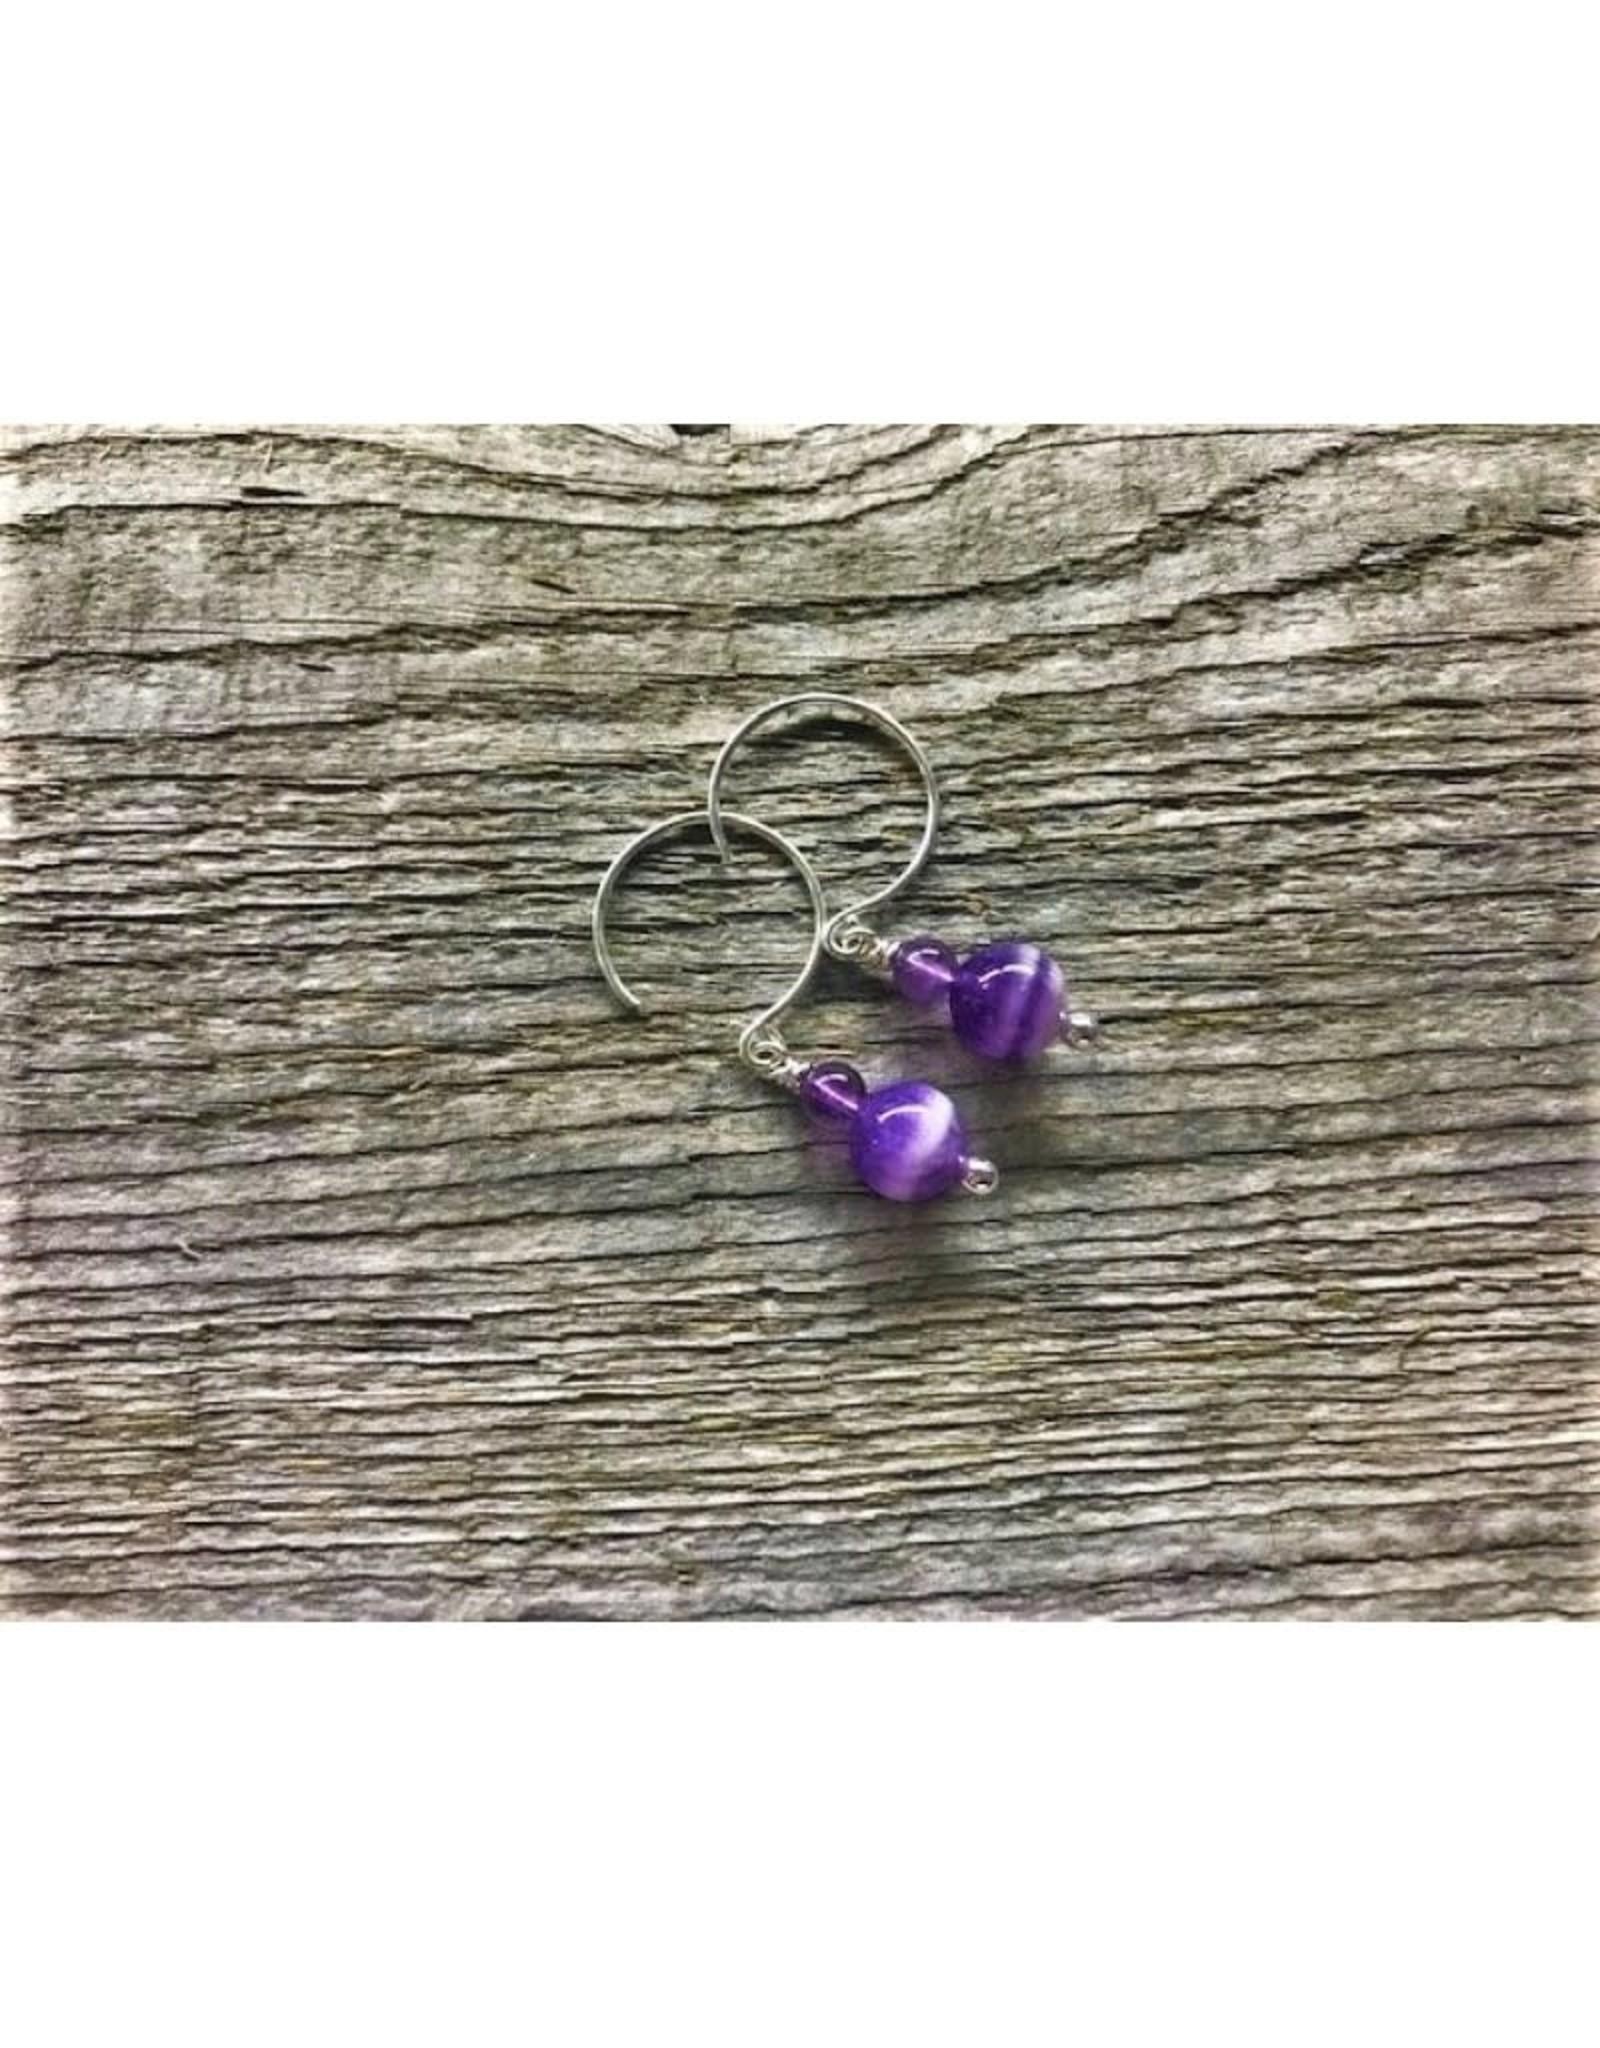 Circle Earrings - Amethyst 2 Bead